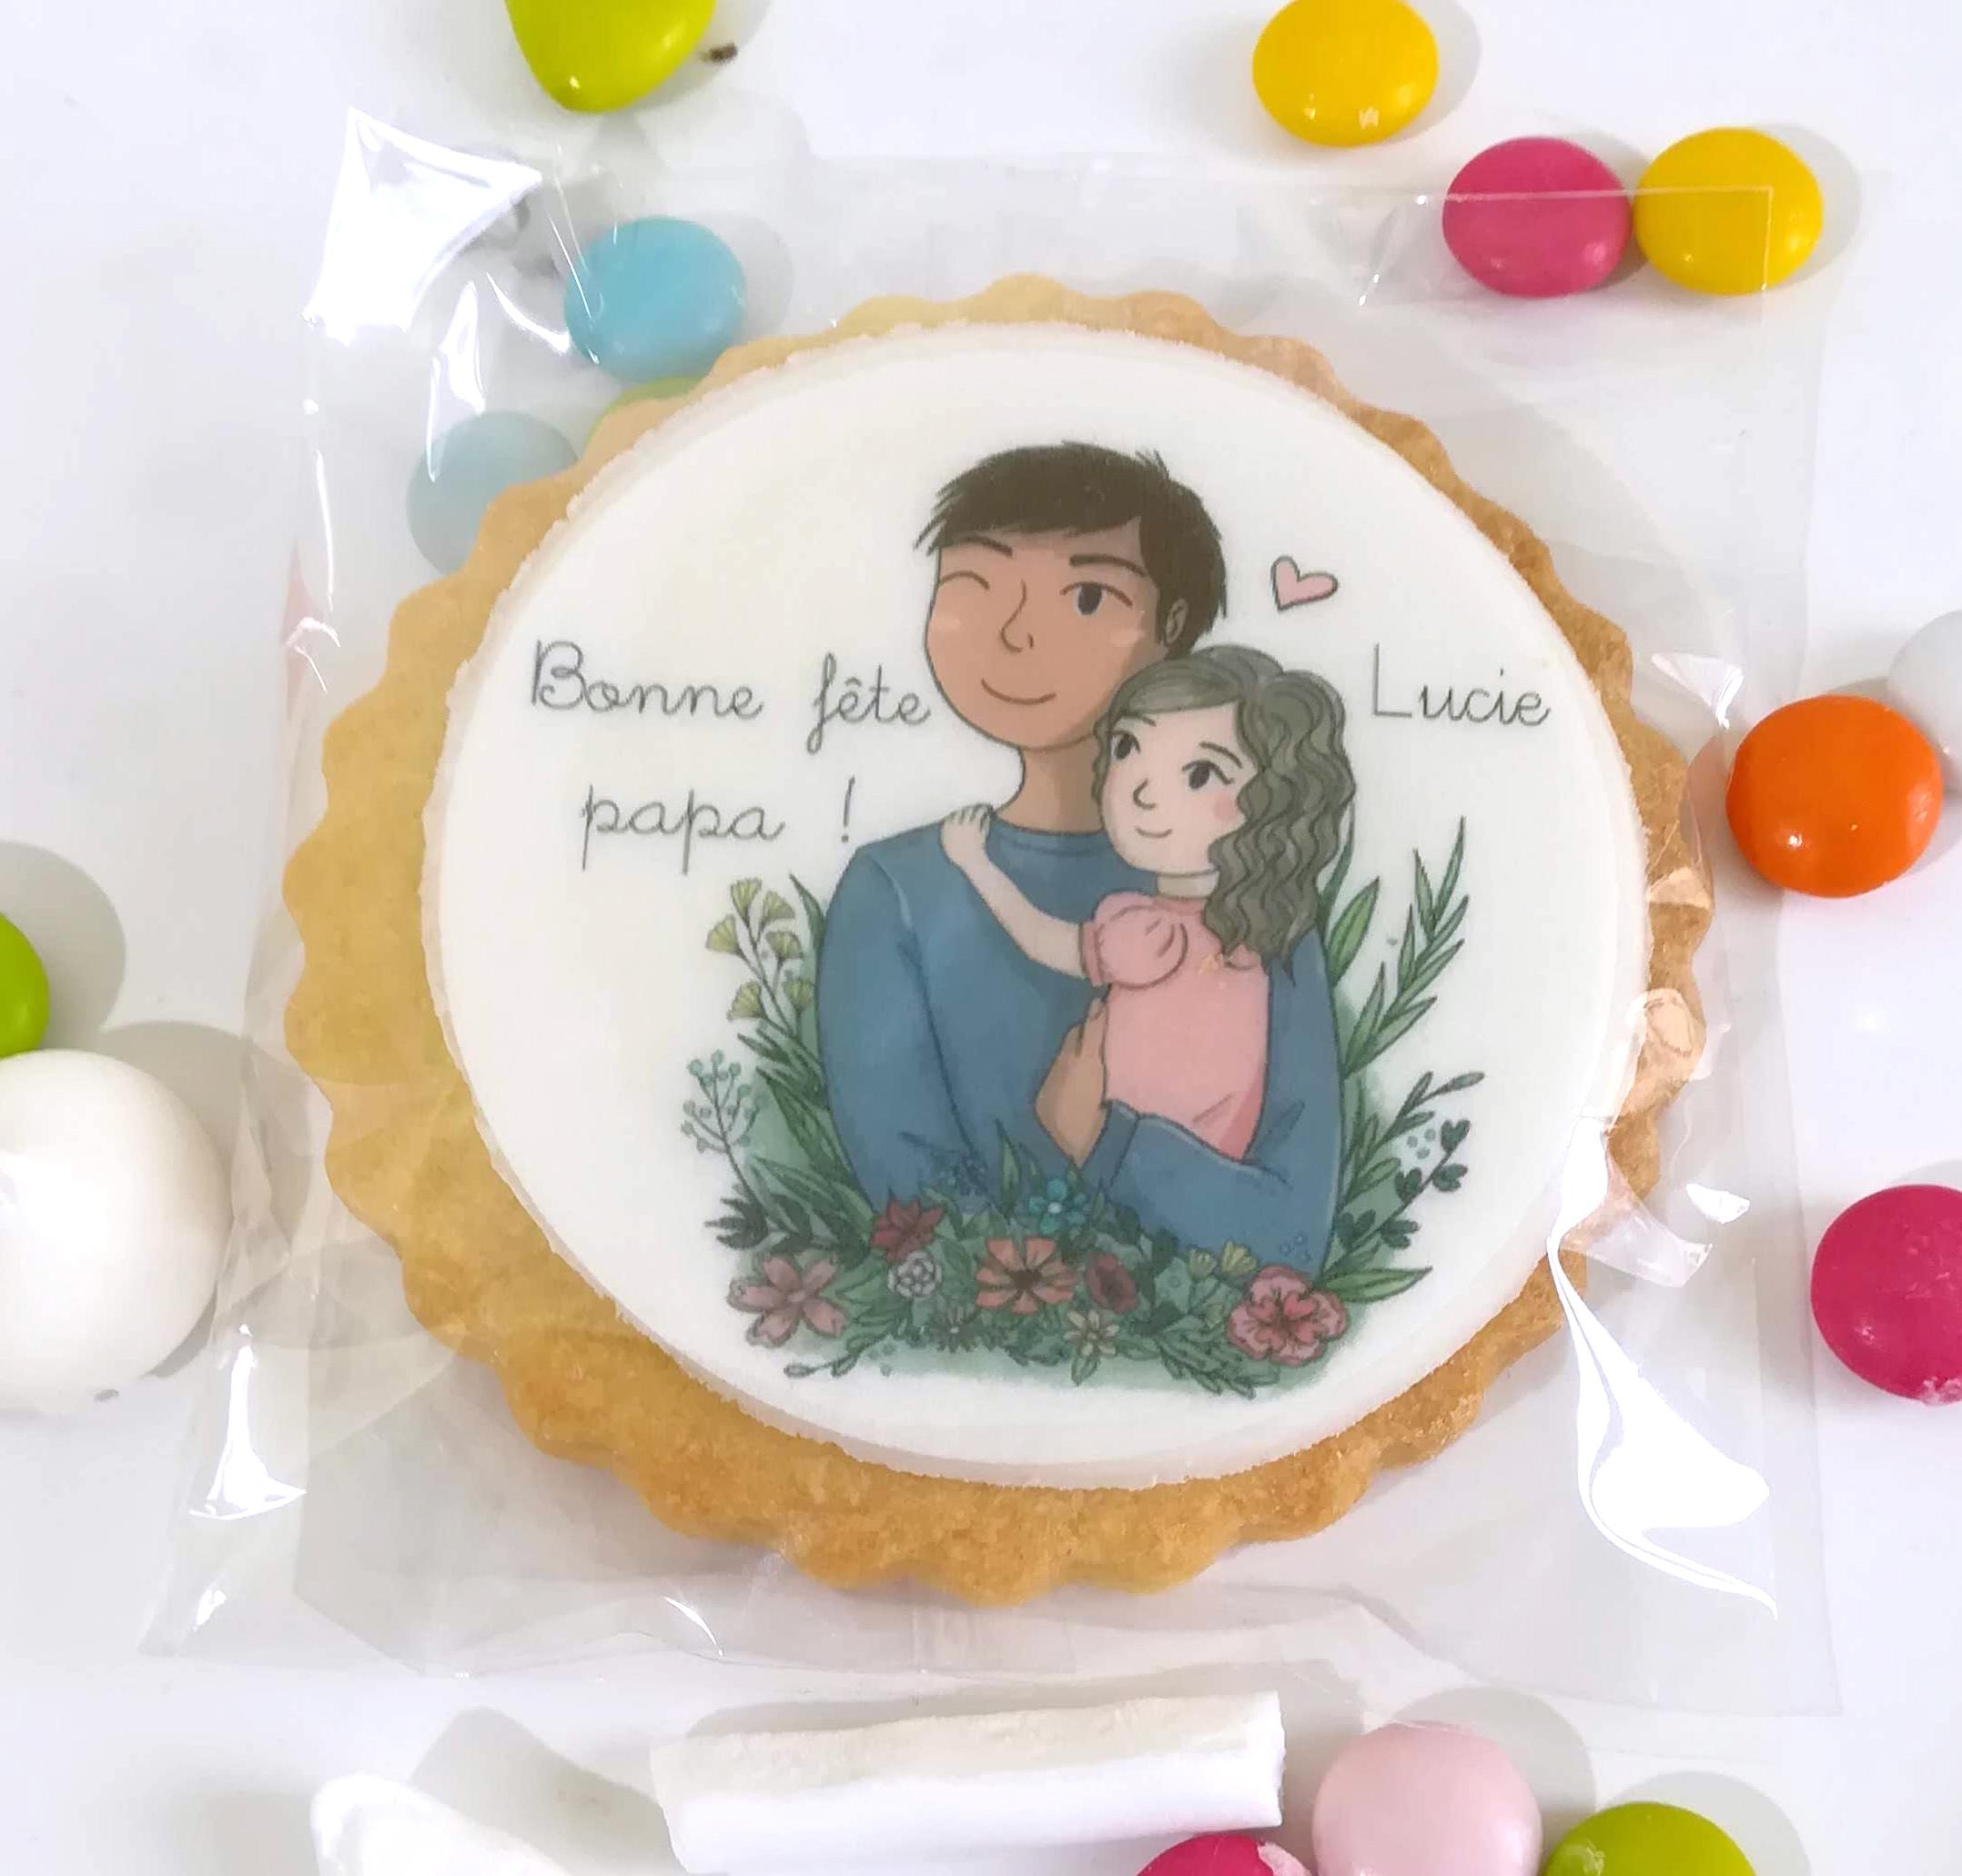 biscuit-decore-personnalise-fete-pere-fille